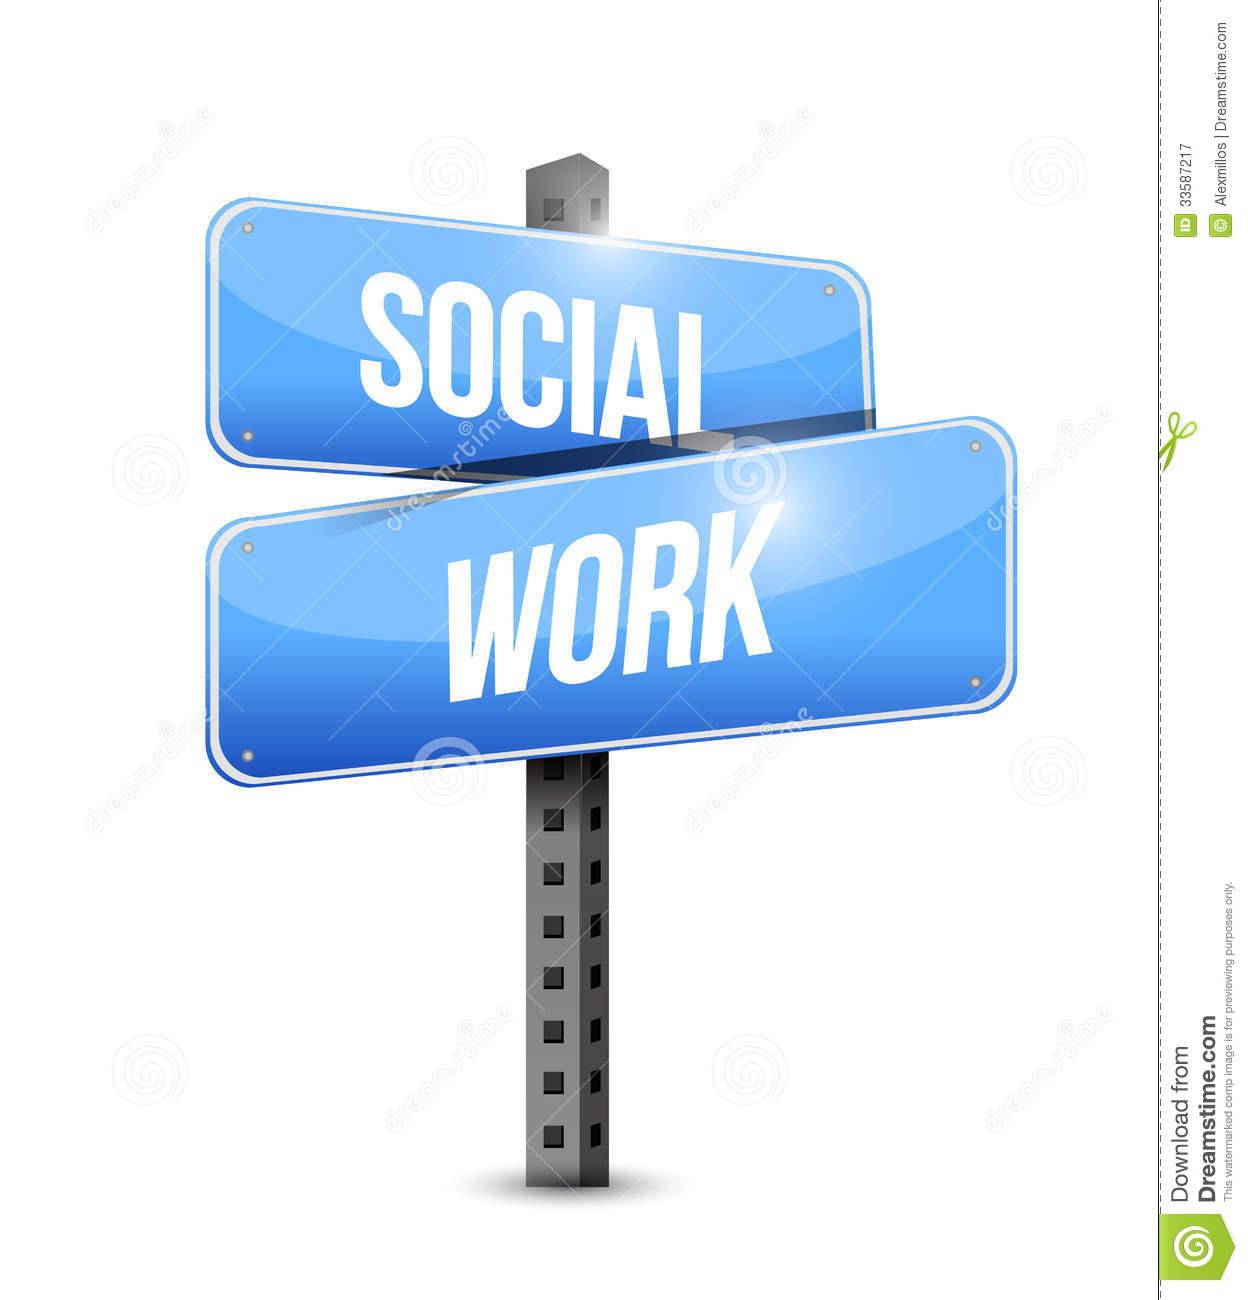 Social Work Clipart Social work road sign 1248x1300